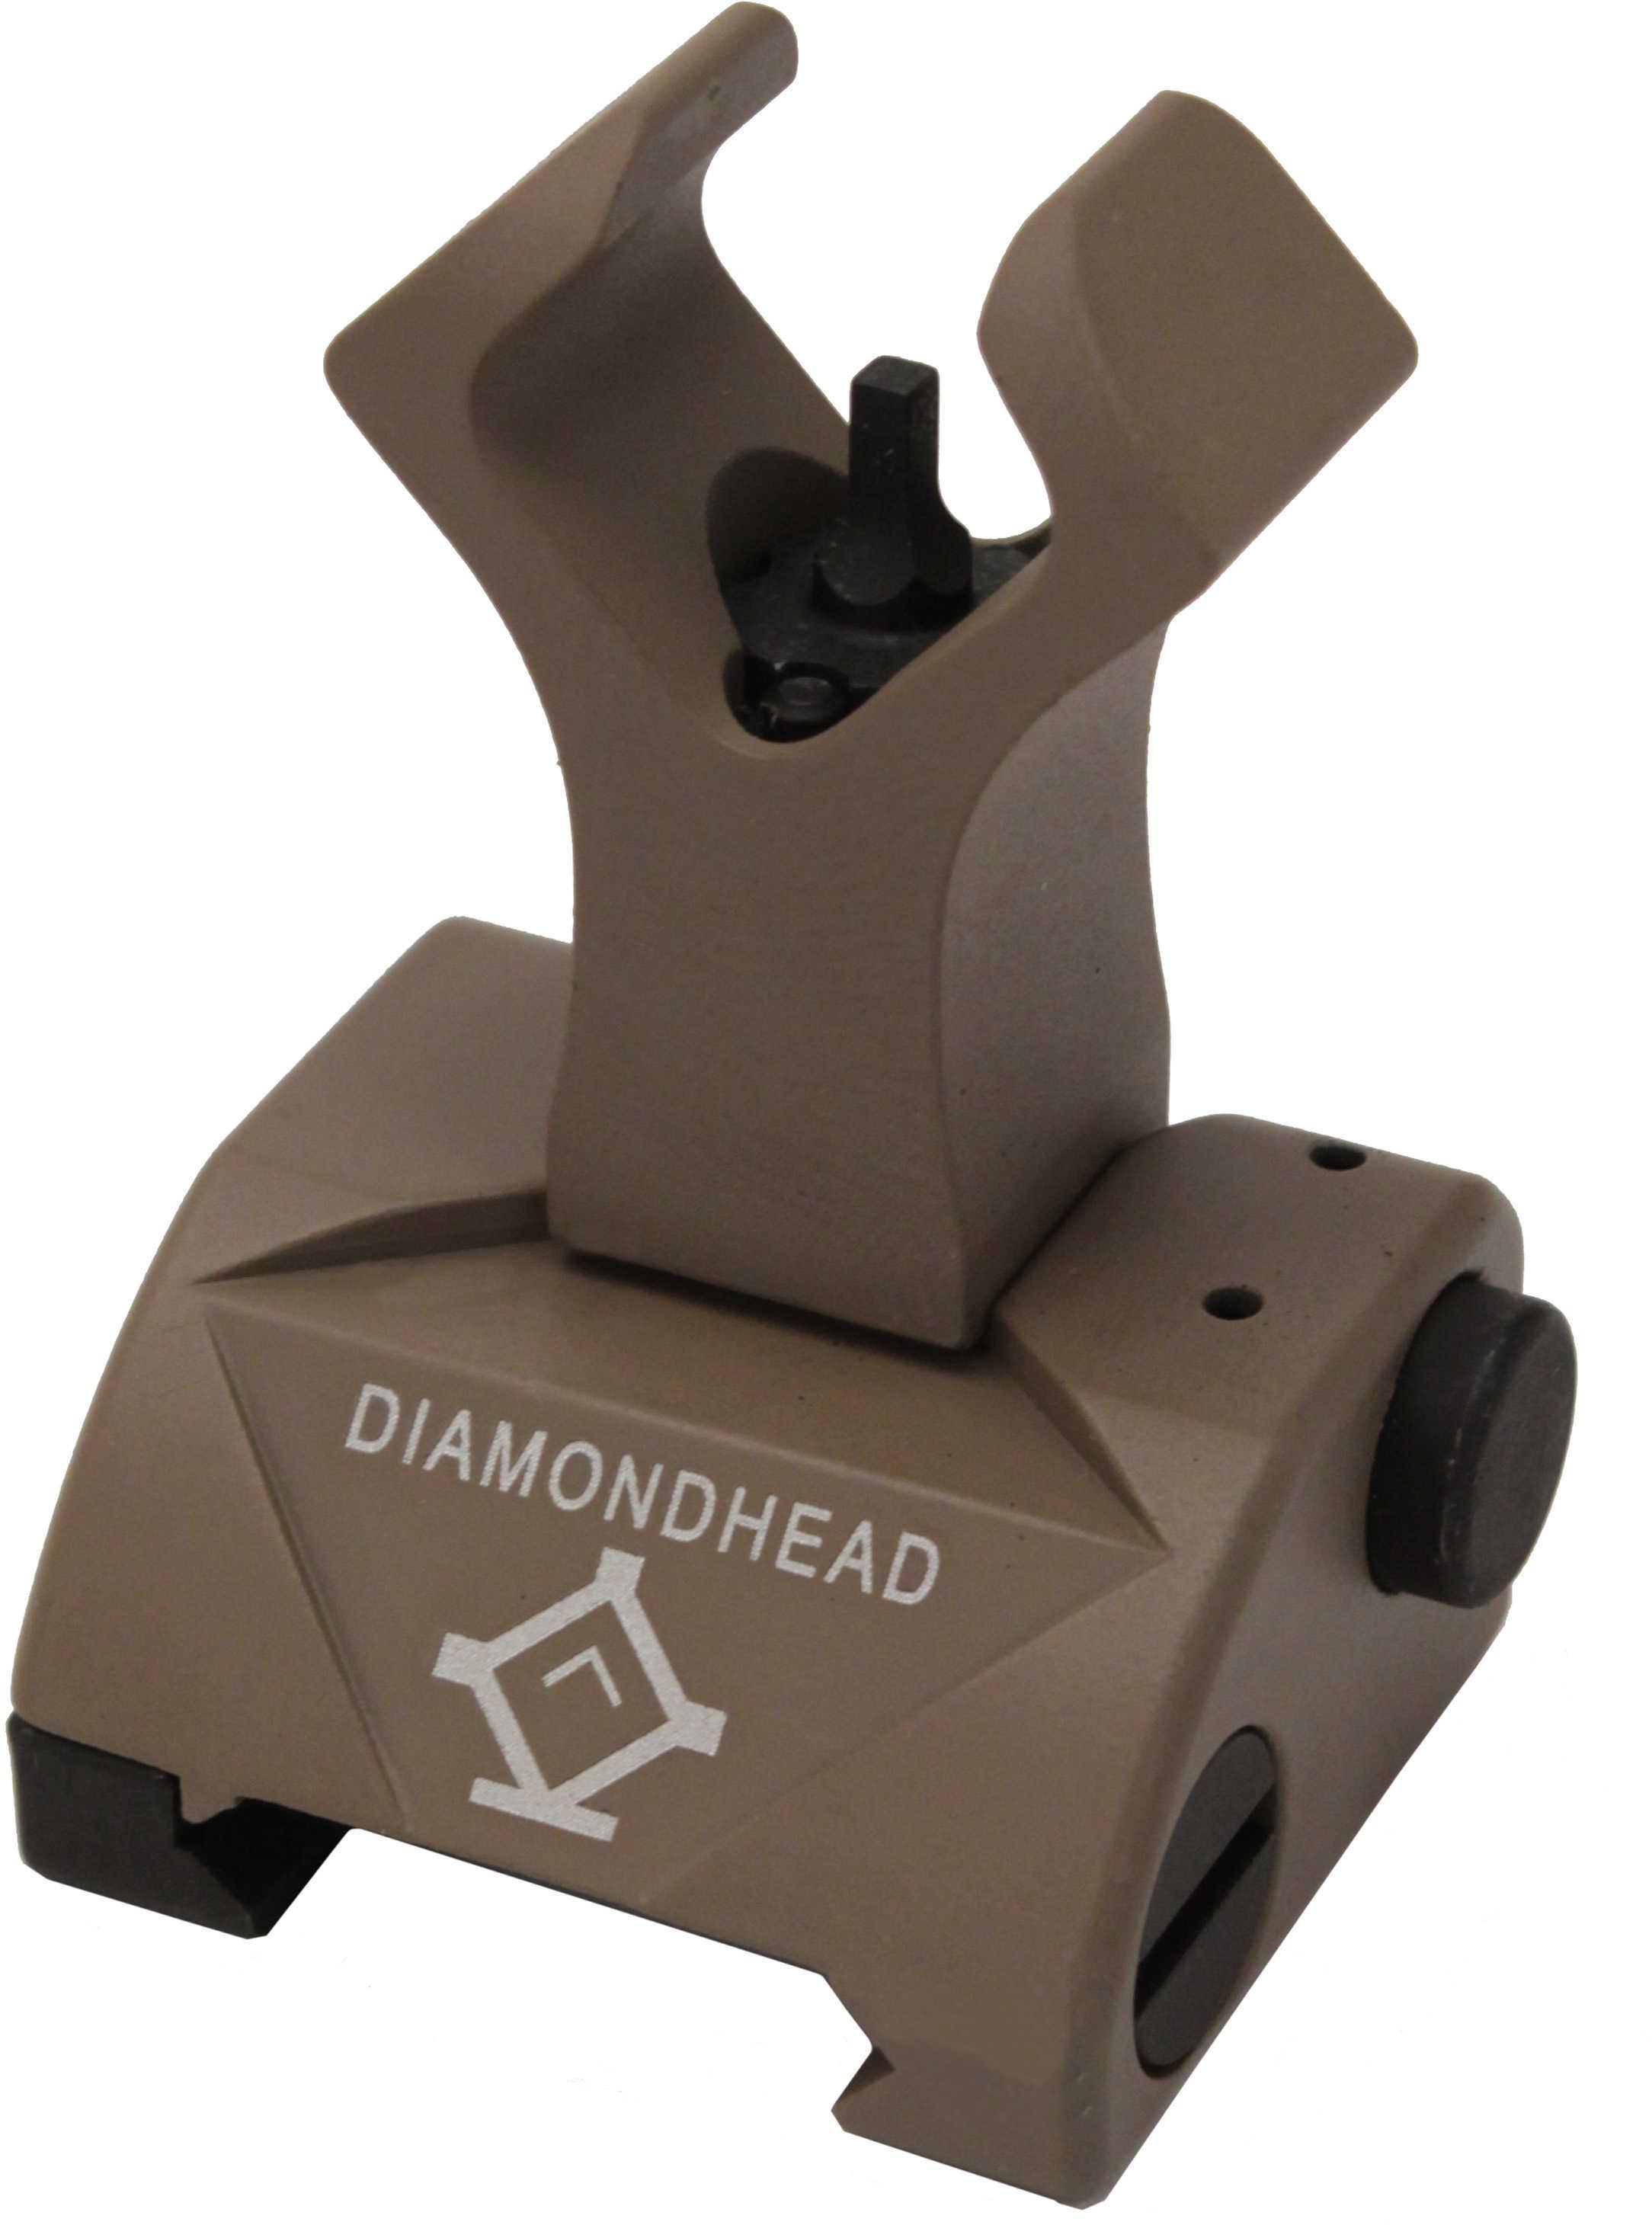 Diamondhead Diamond Sight Front Sight, Flat Dark Earth Md: 1052